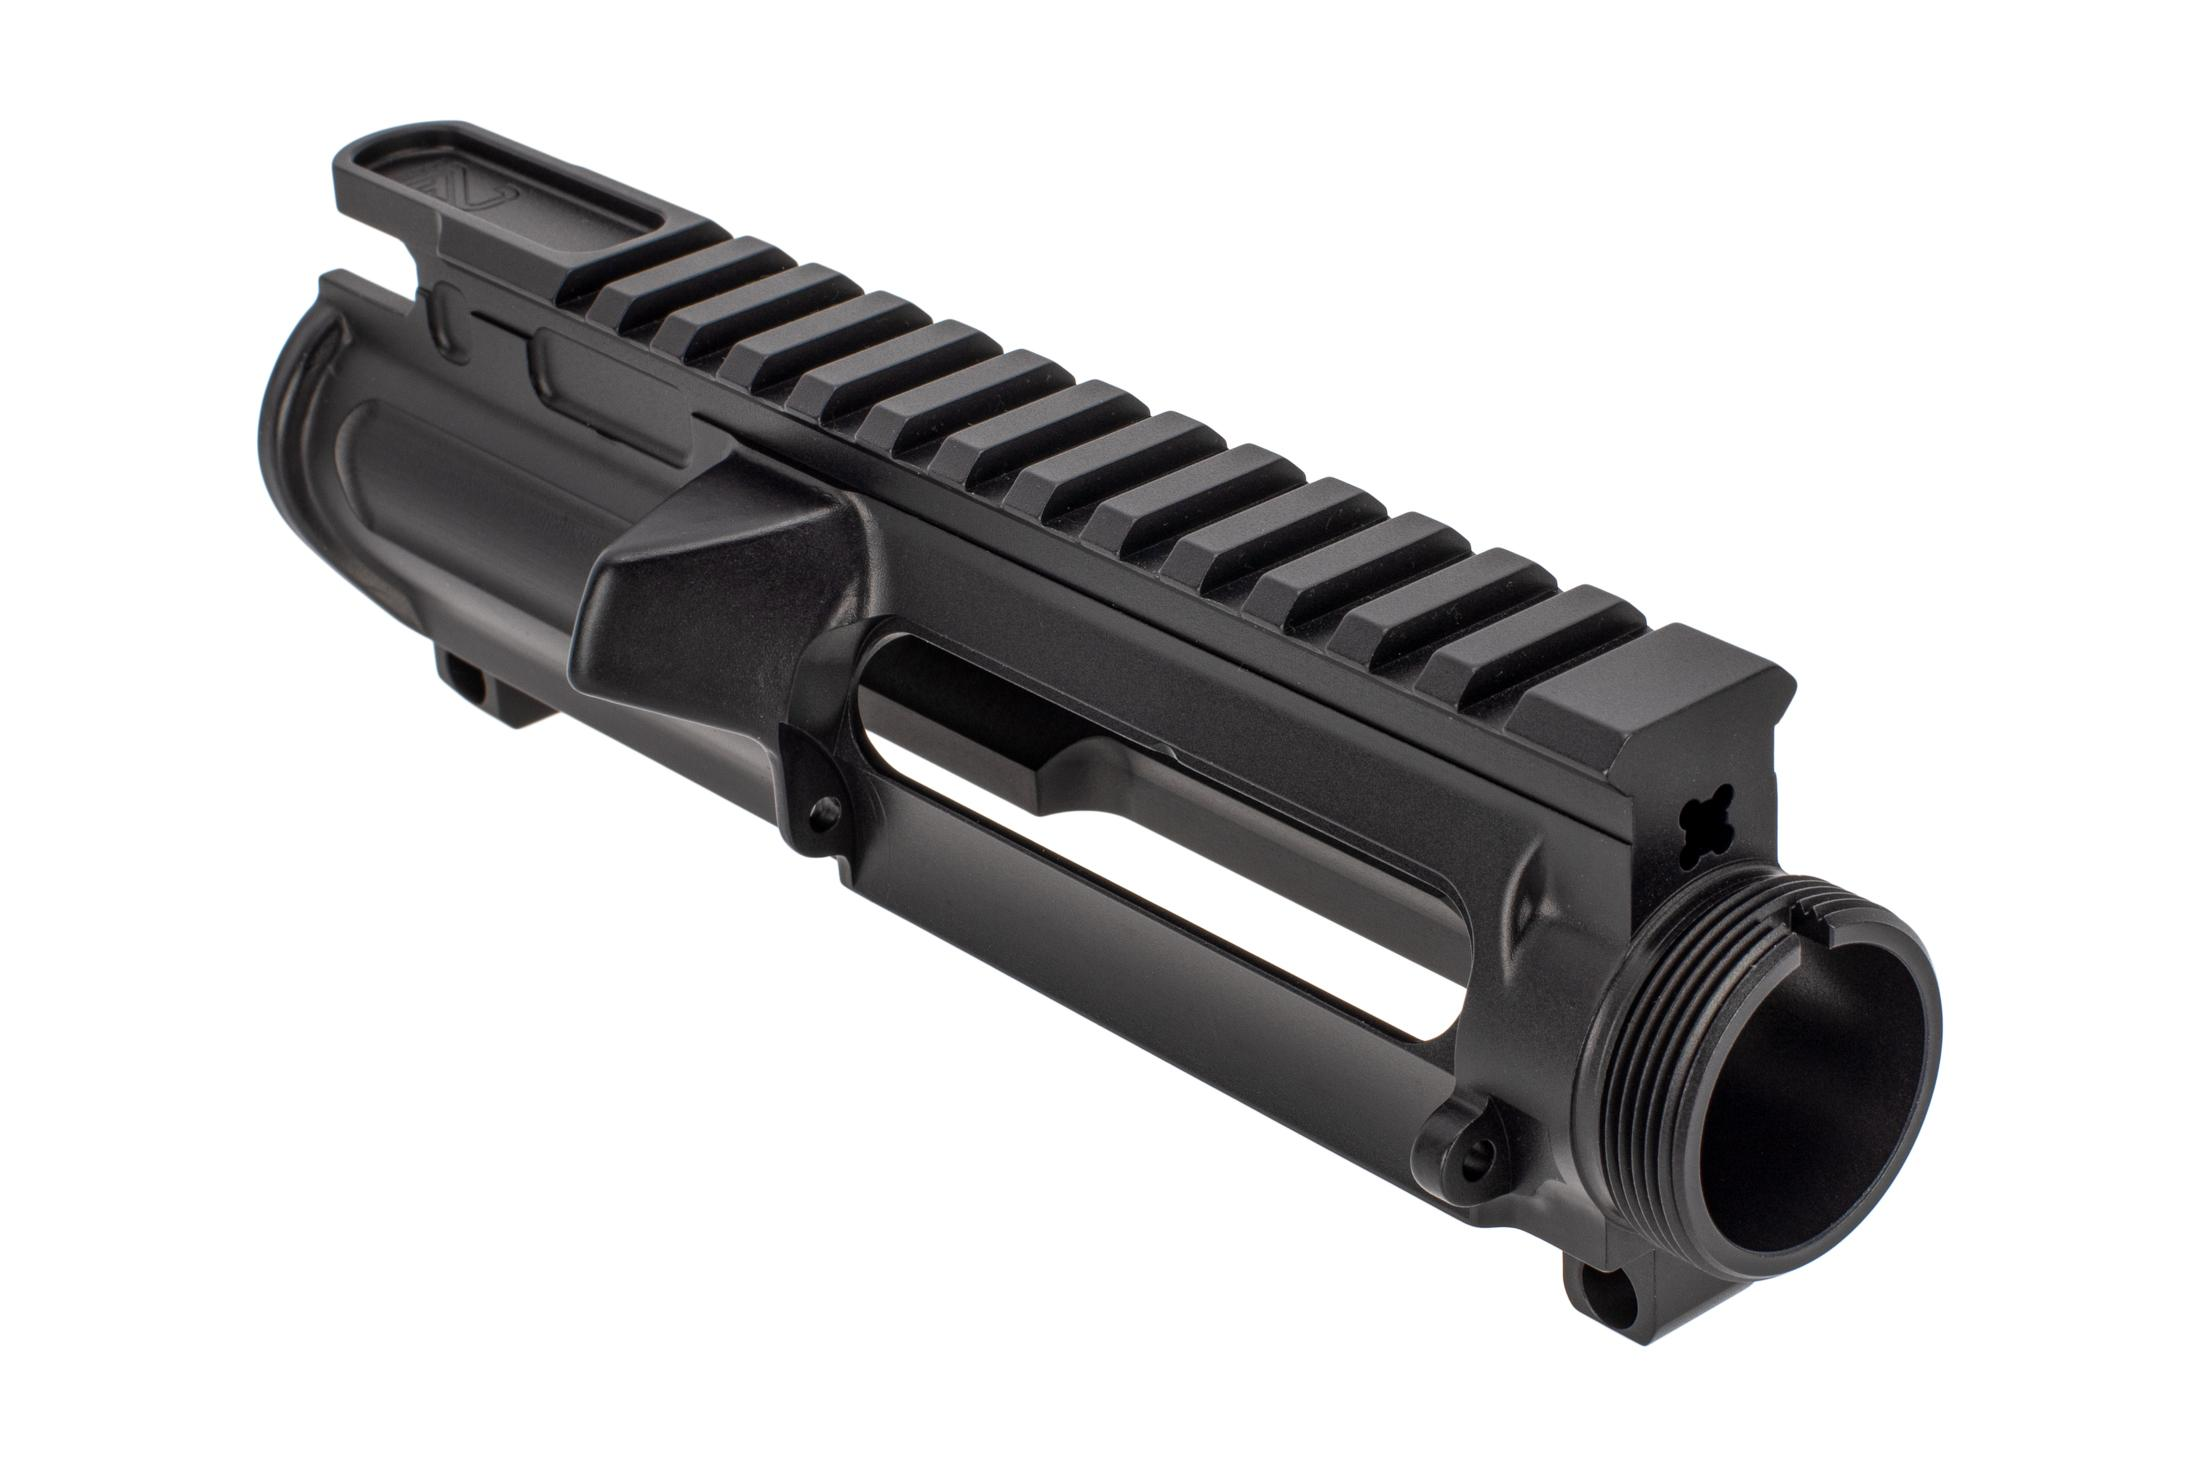 2A Armament Palouse-Lite AR-15 Forged Upper Receiver